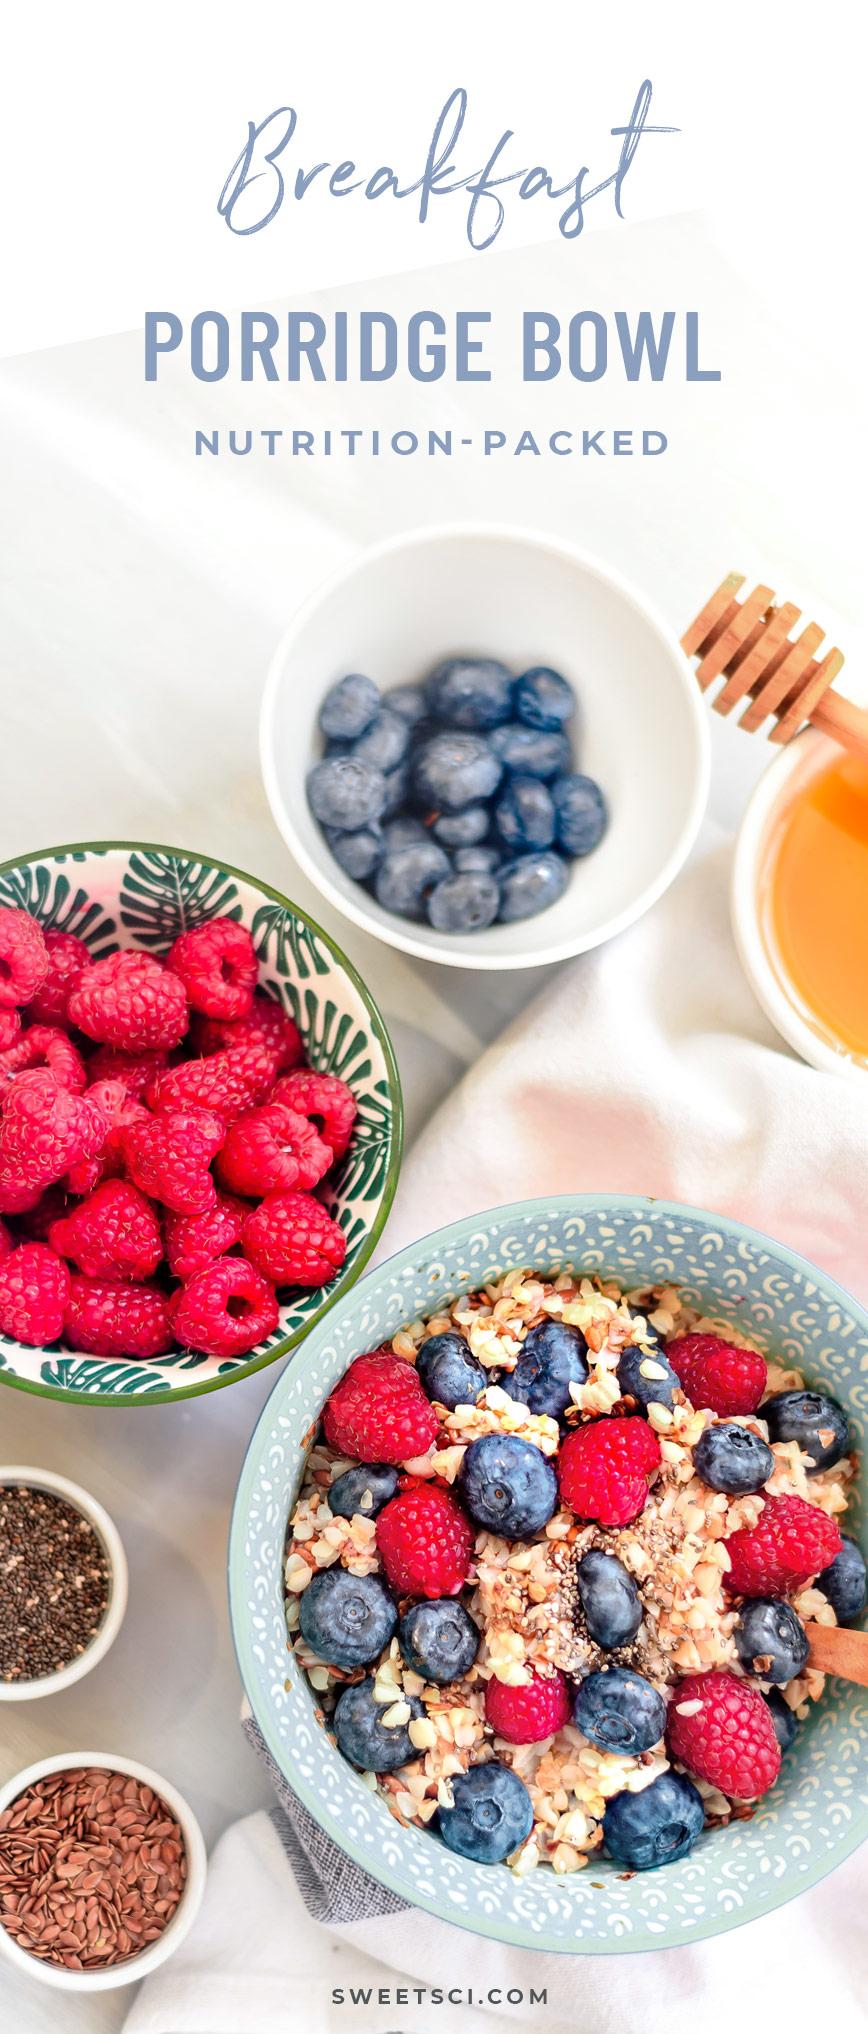 Breakfast Porridge Bowl Recipe: Grains - buckwheat, quinoa, brown rice, oats… raisins, berries, nuts, seeds; coconut flakes; dash of cinnamon or raw honey - Sweet Science Nutrition & Wellness, Healthy Sobriety with health coach Elena Skroznikova - Healthy Breakfast, Easy Recipe, Healthy Recipe, Healthy Breakfast Recipe, Healthy Breakfast Bowl